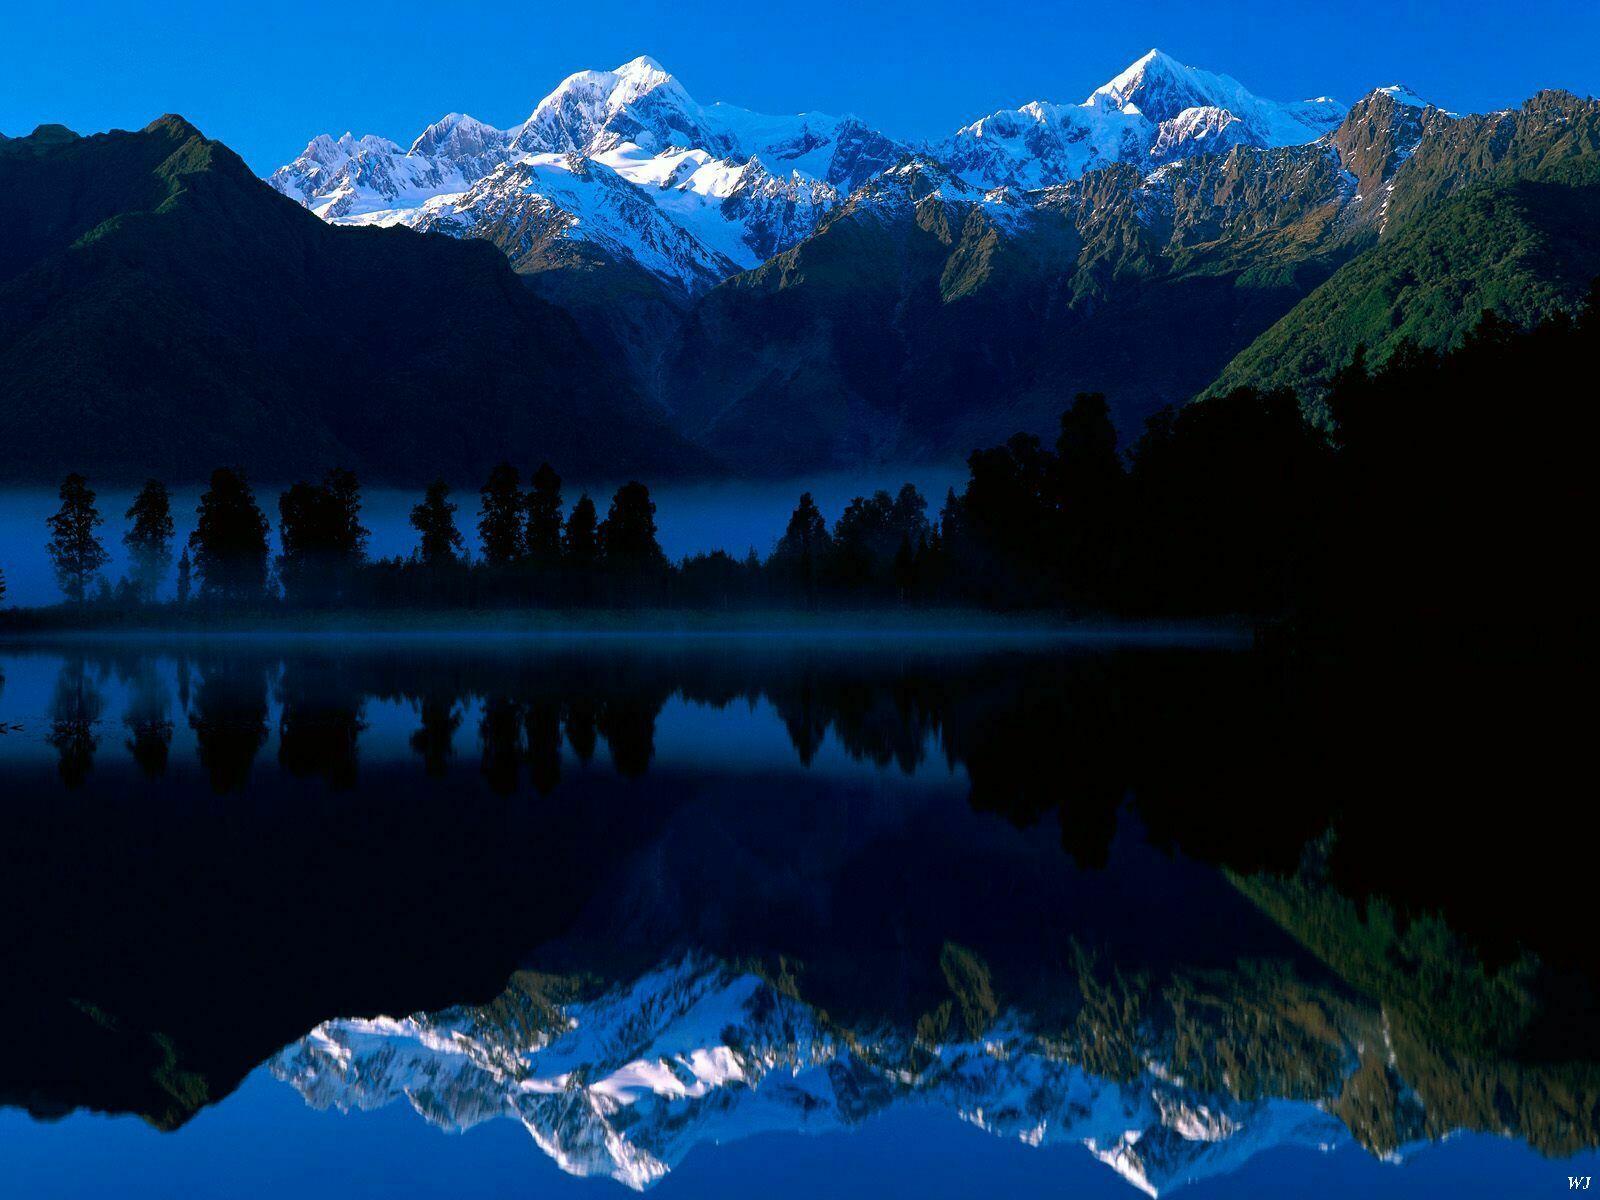 Landscape Lake Matheson Reflects Mount Tasman And Mount Cook New Zealand